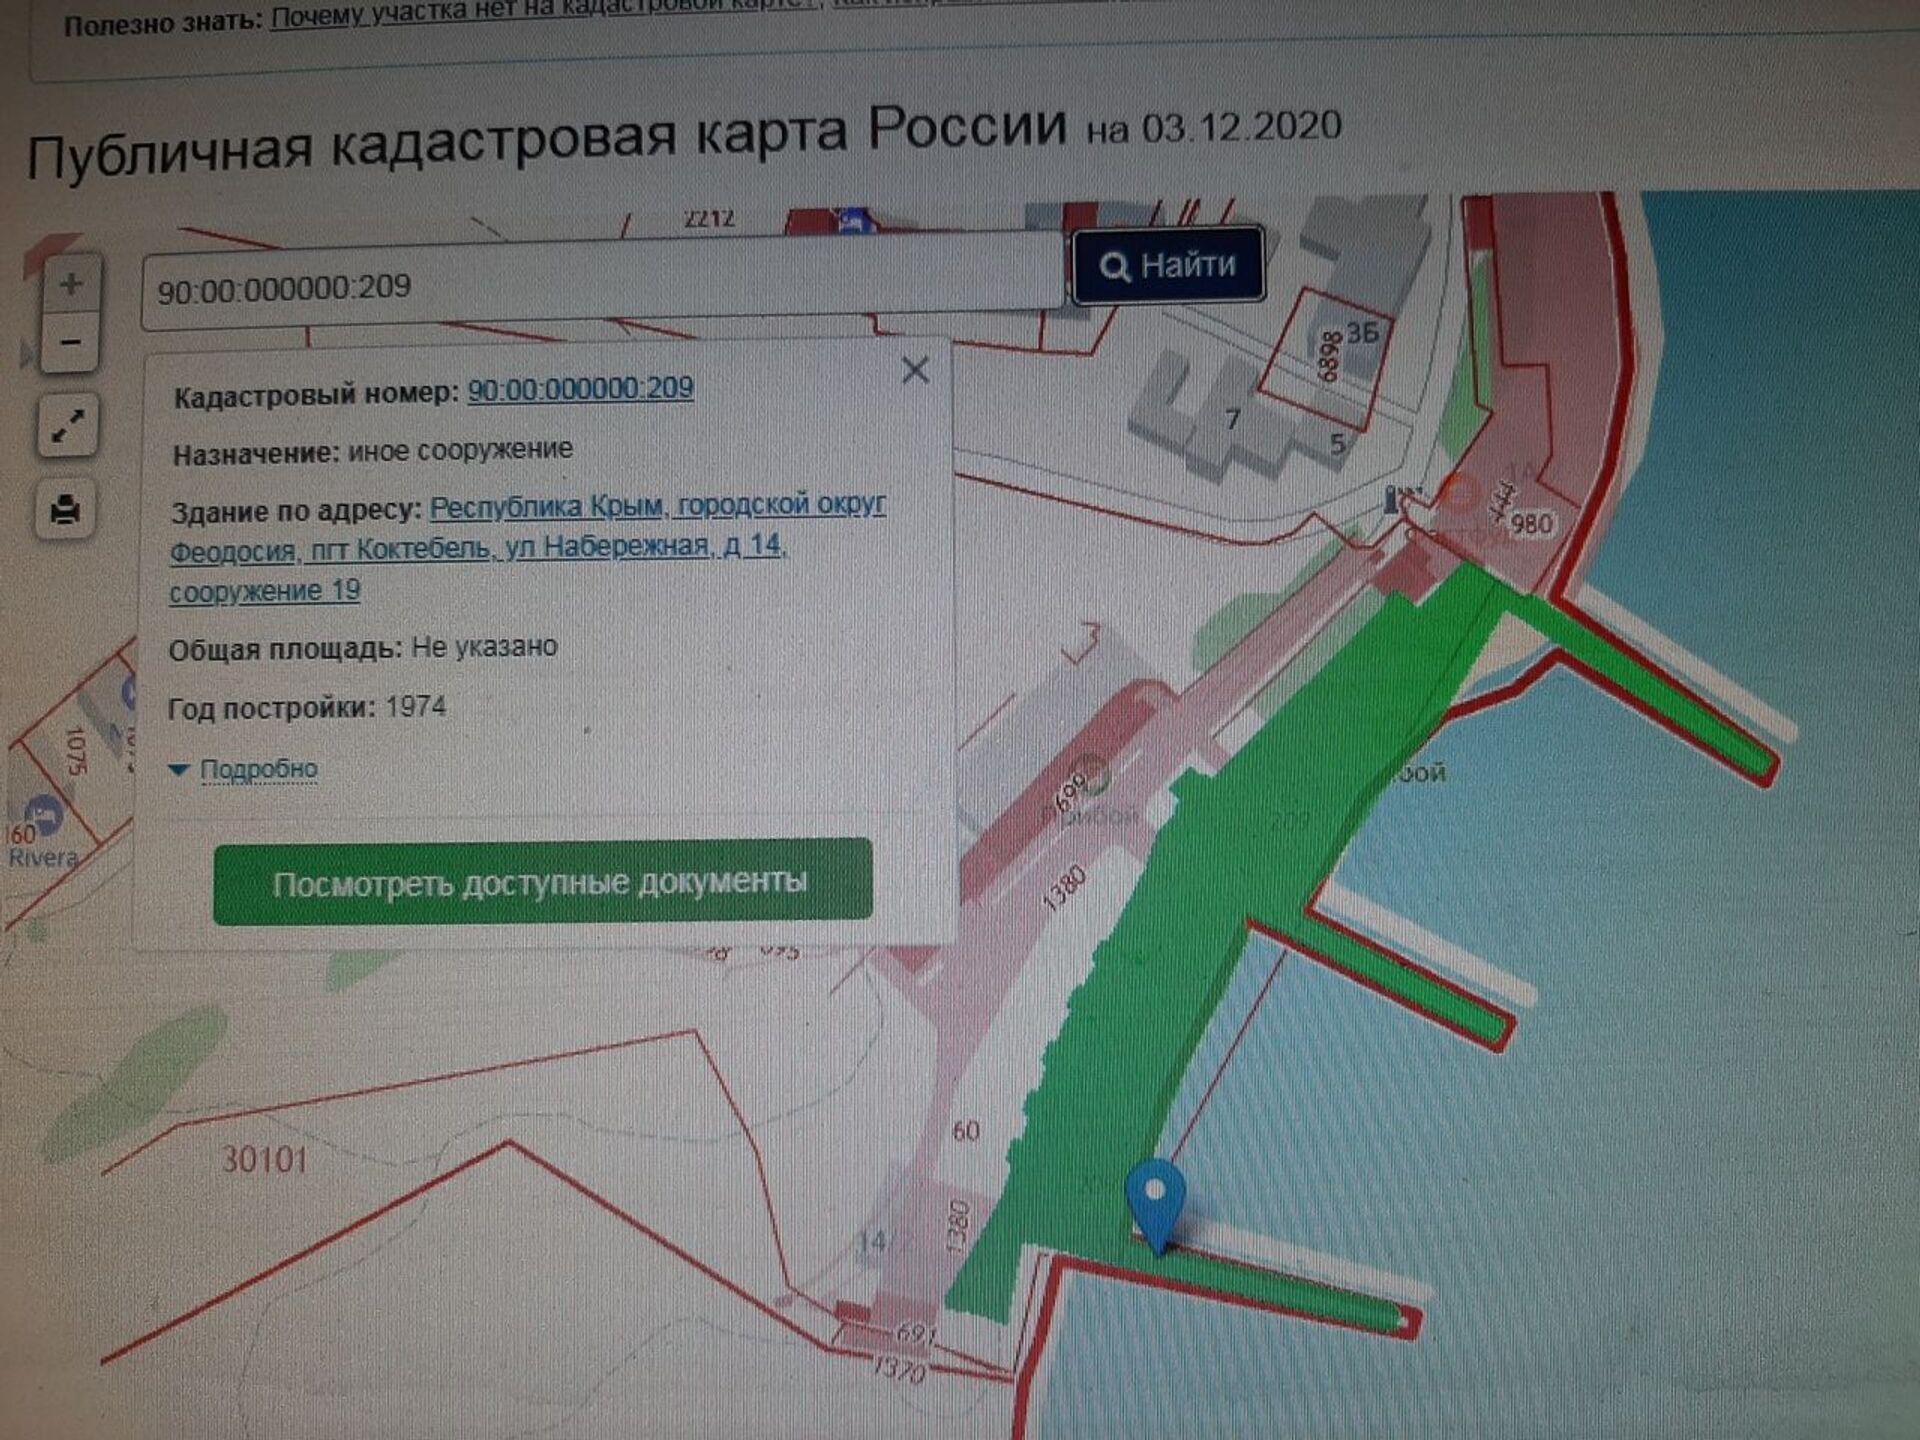 Прибой за 76 млн: в Коктебеле продают базу отдыха вместе с пляжем - РИА Новости, 1920, 03.12.2020